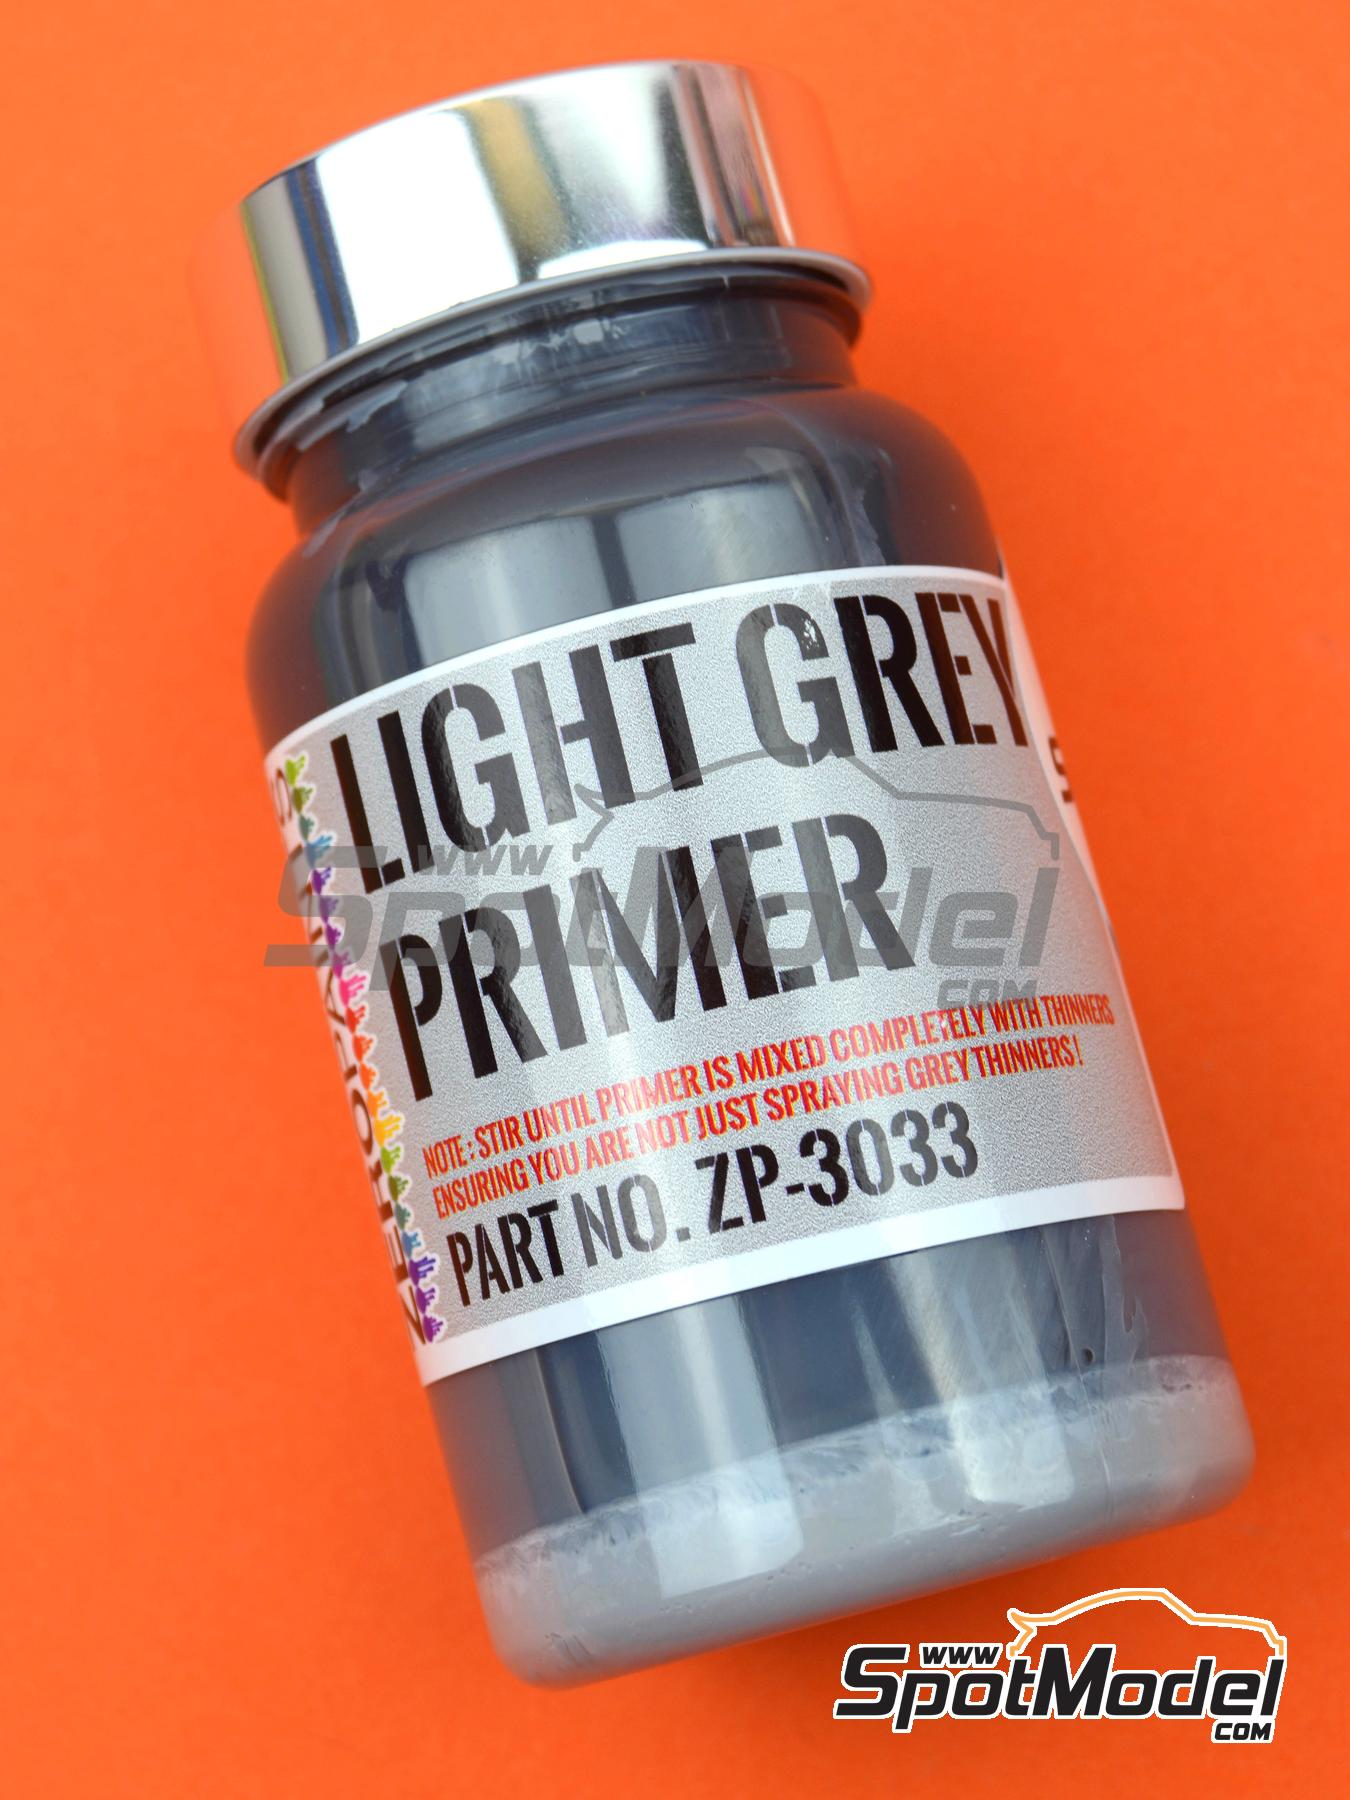 Light Grey Primer - 120ml | Primer manufactured by Zero Paints (ref.ZP-3033) image